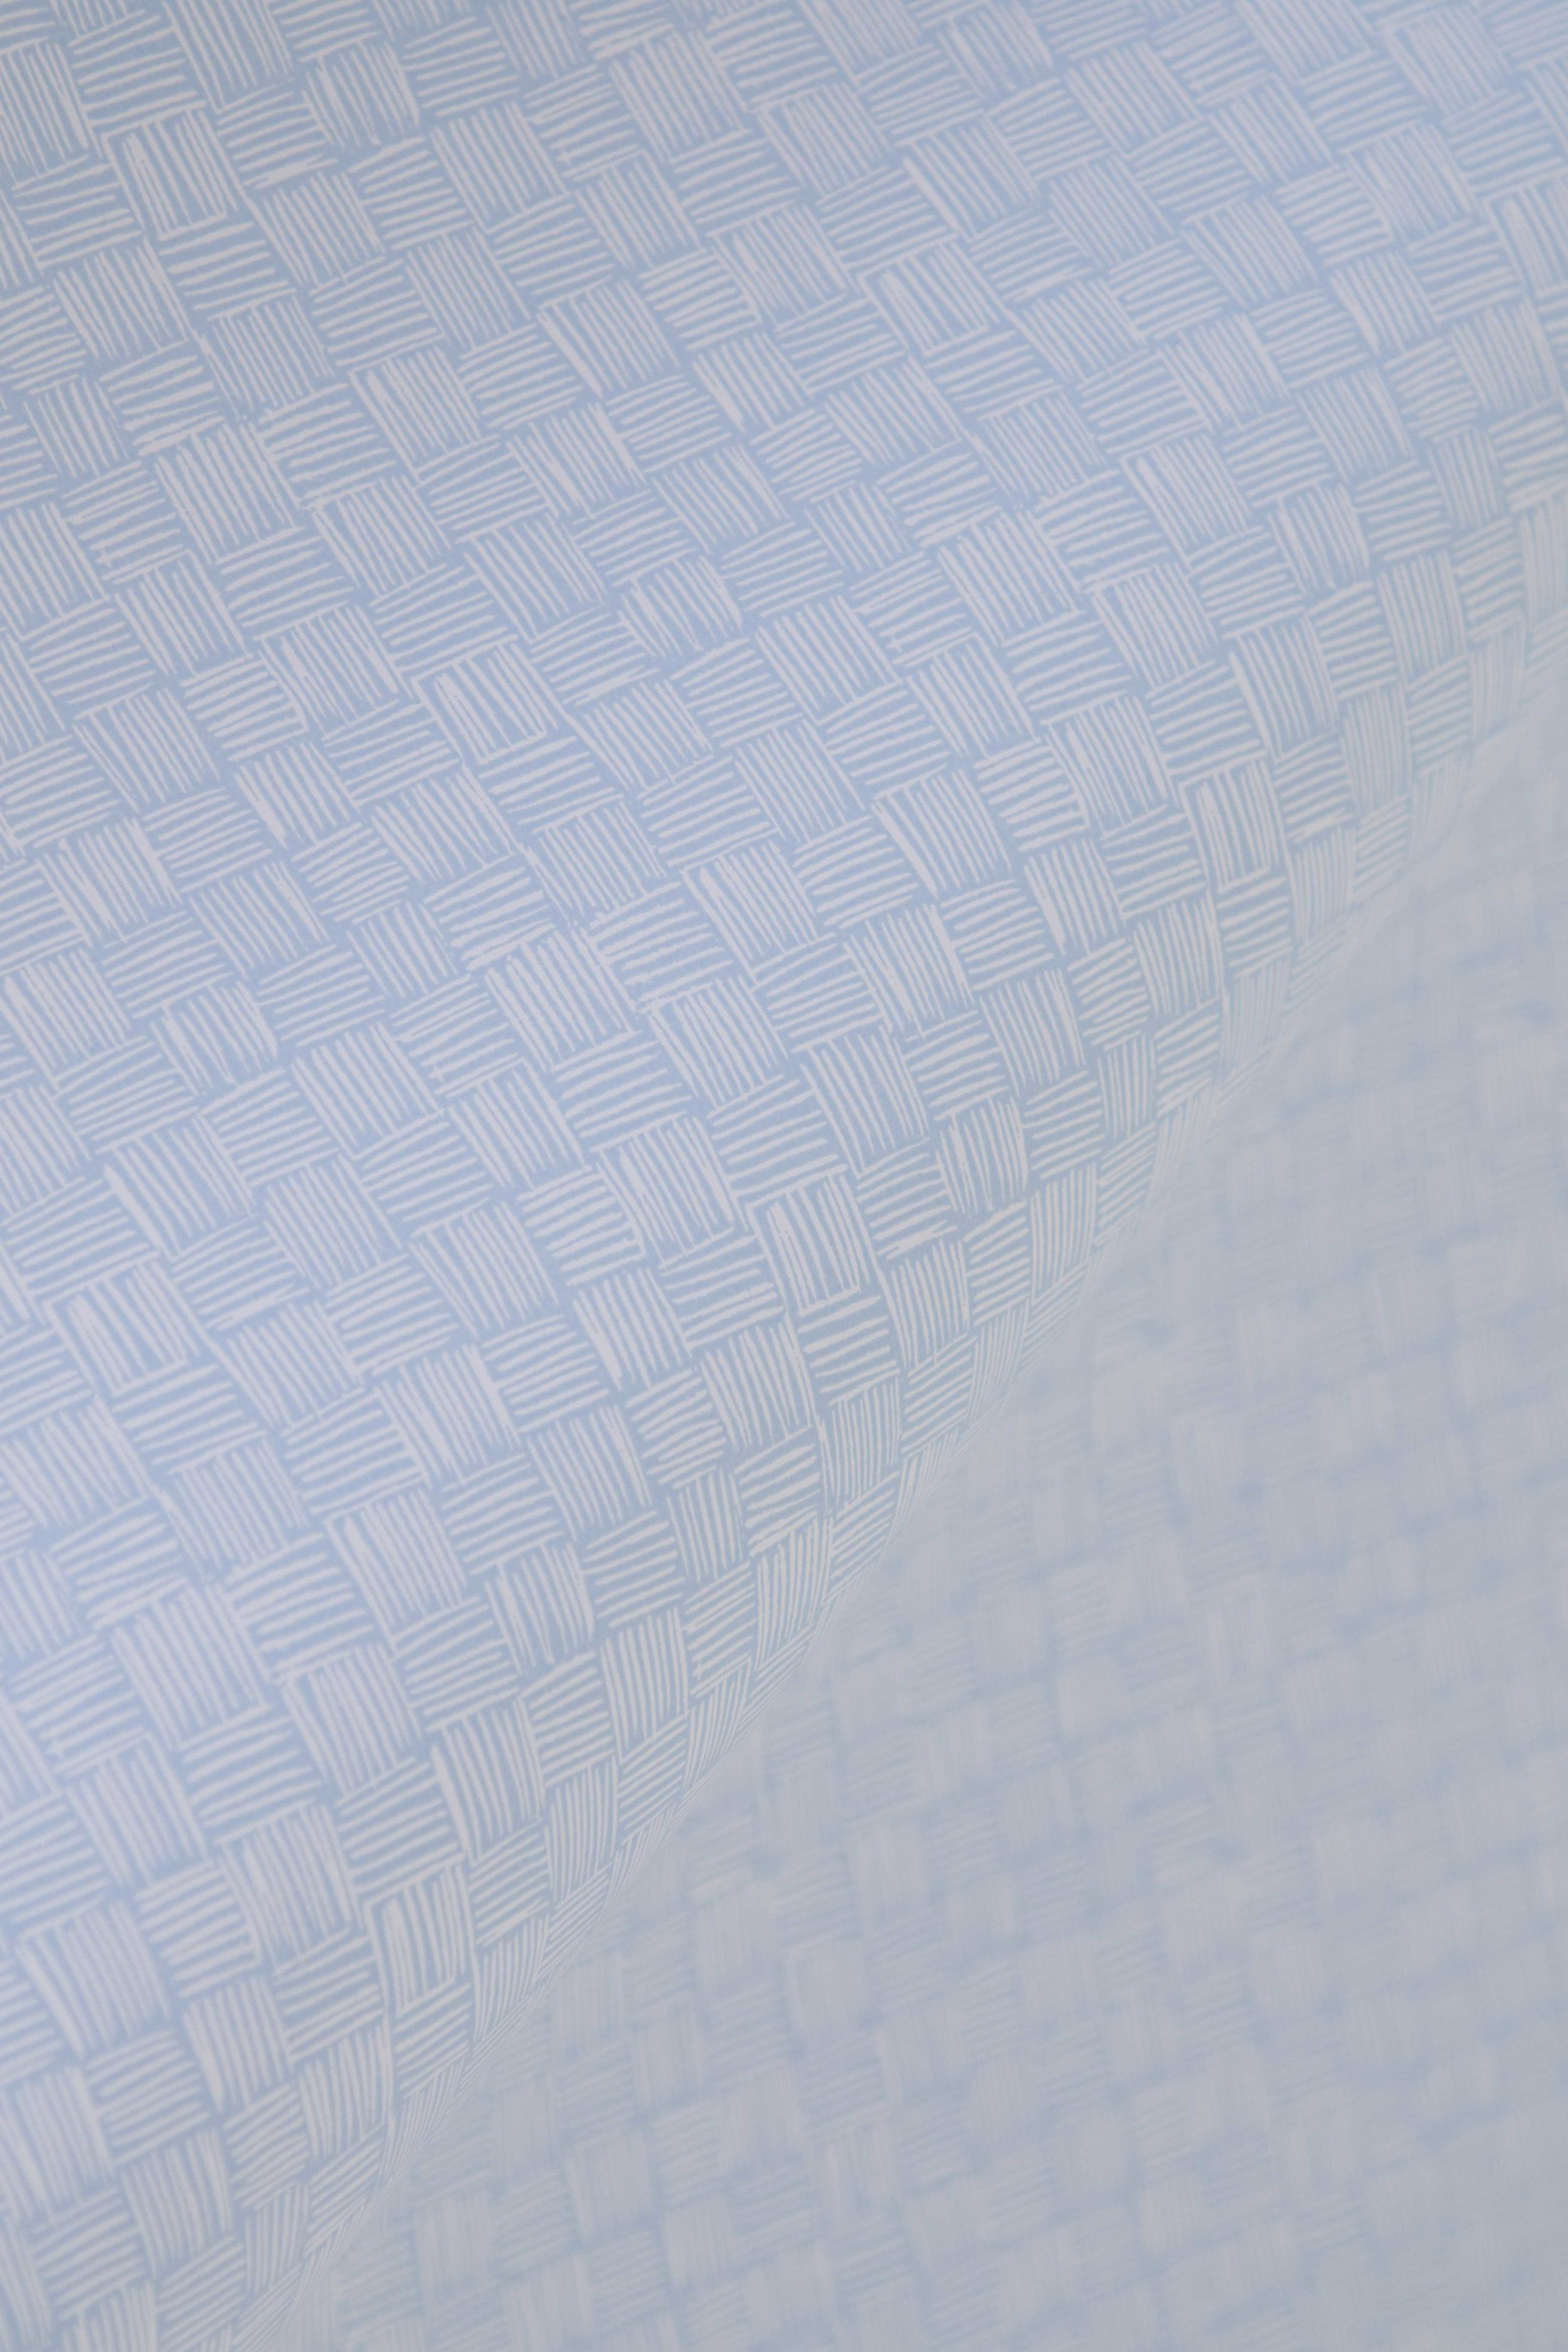 Woven in Iceberg, SL203-03